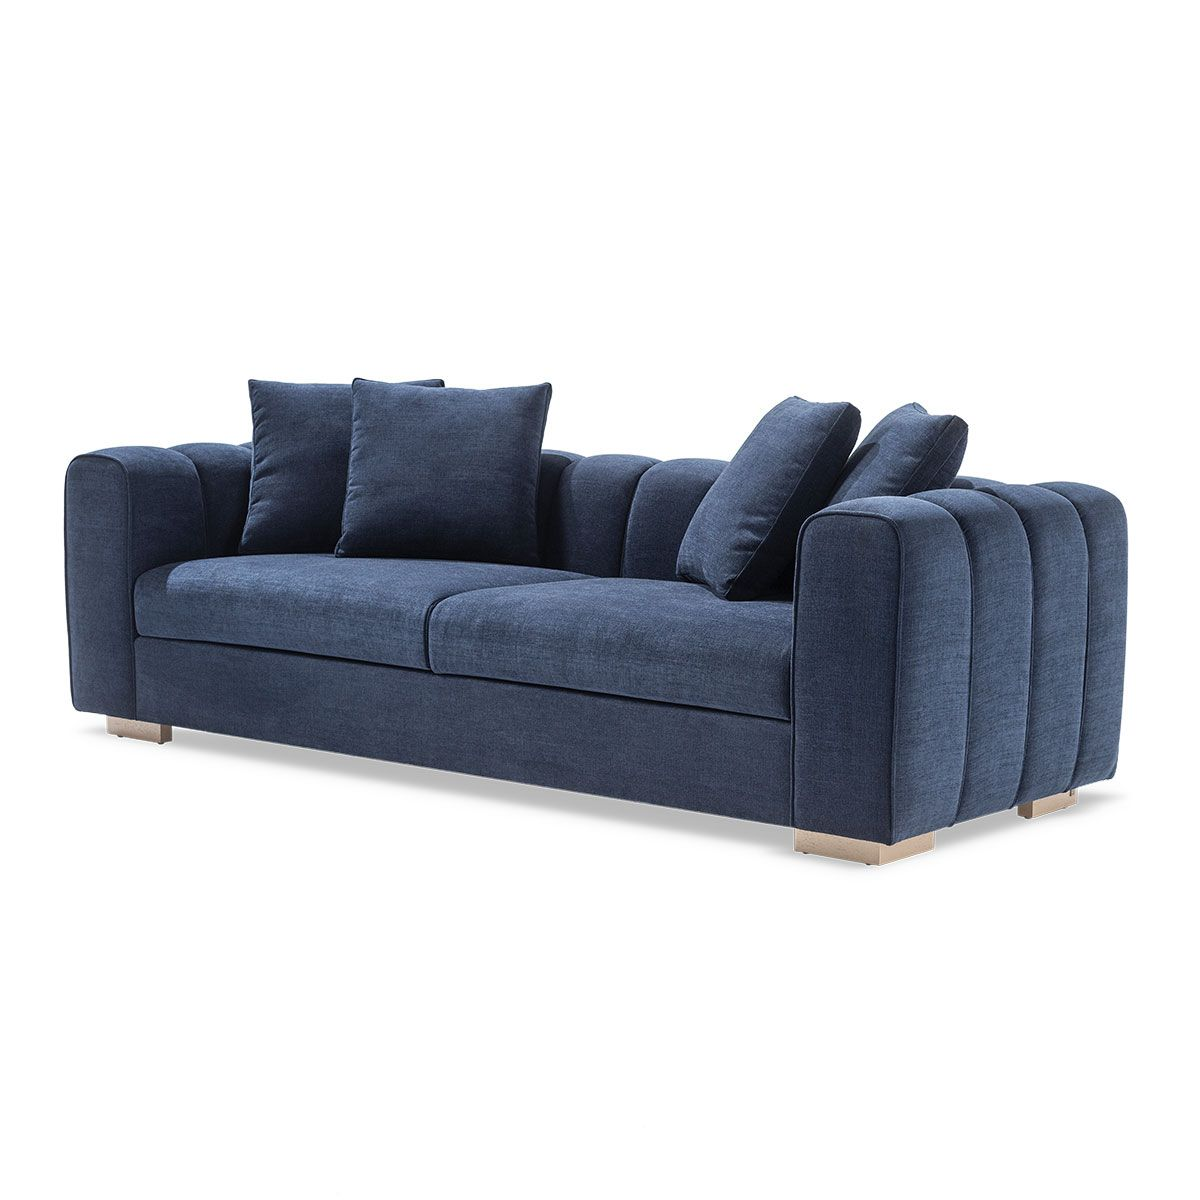 Rumba Sofa 200 Couch Decor Sofa Design Sofa Furniture